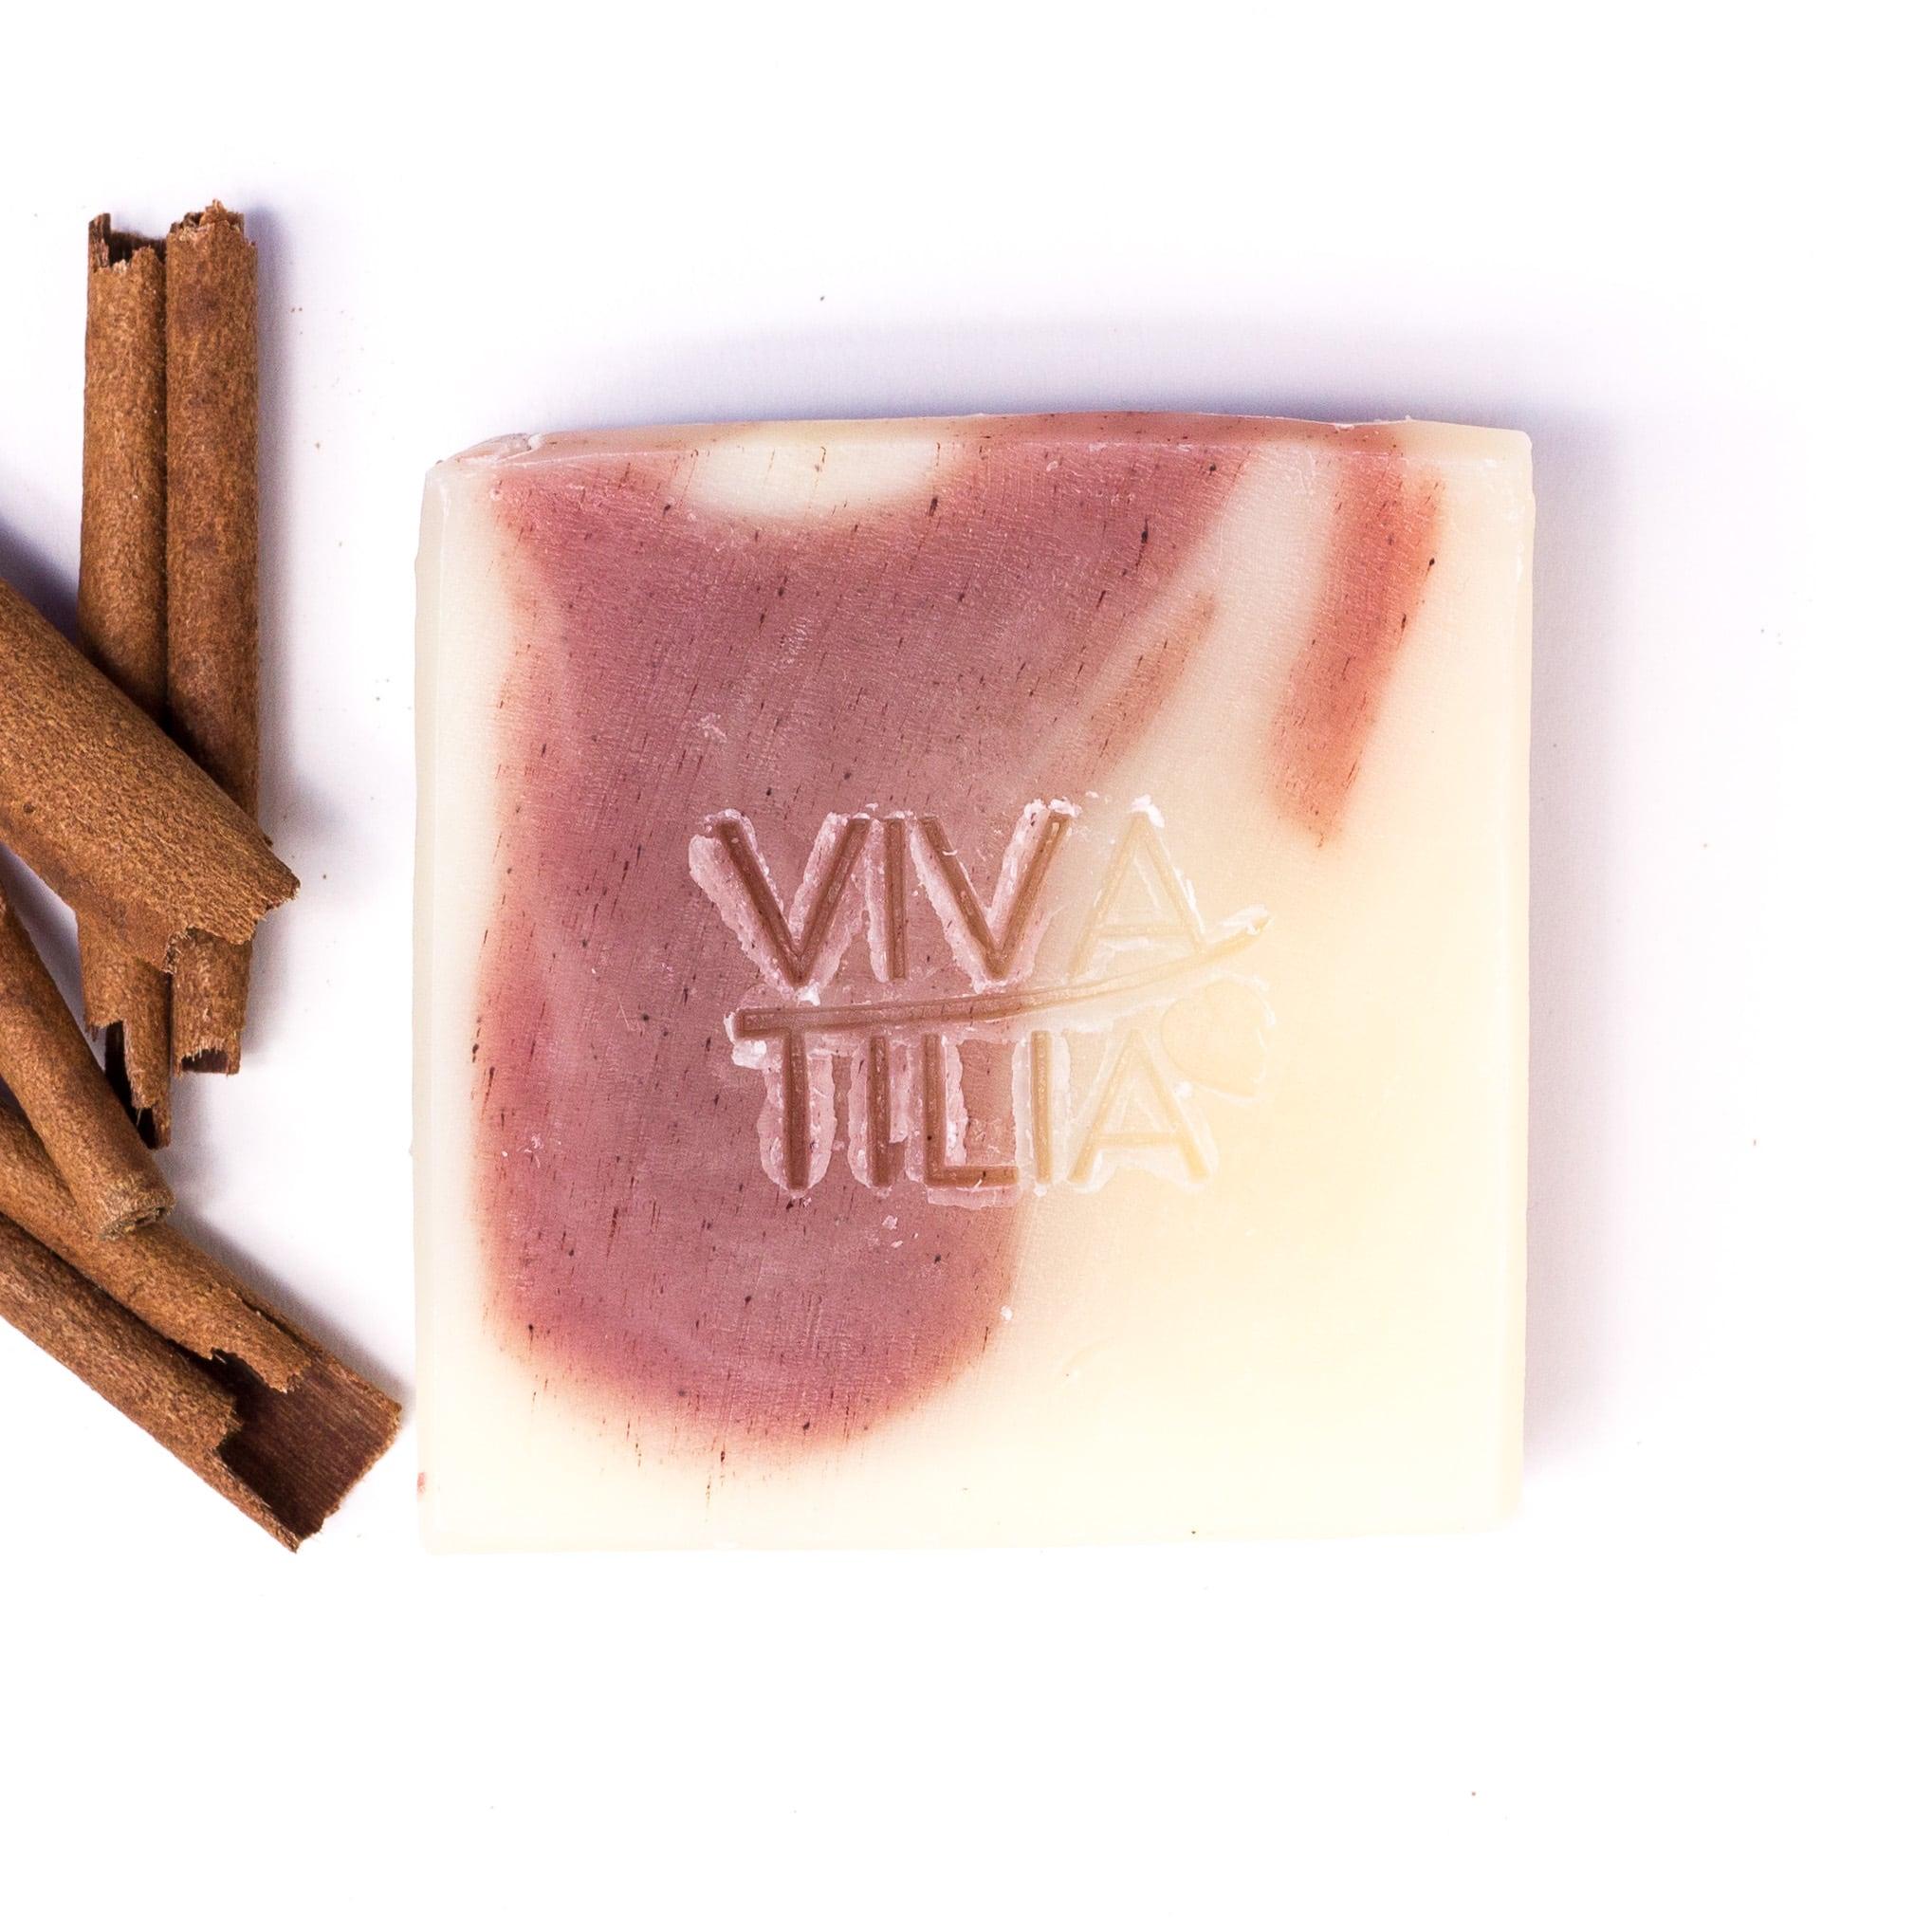 VIVA TILIA Feng Shui Naturseife 90 g